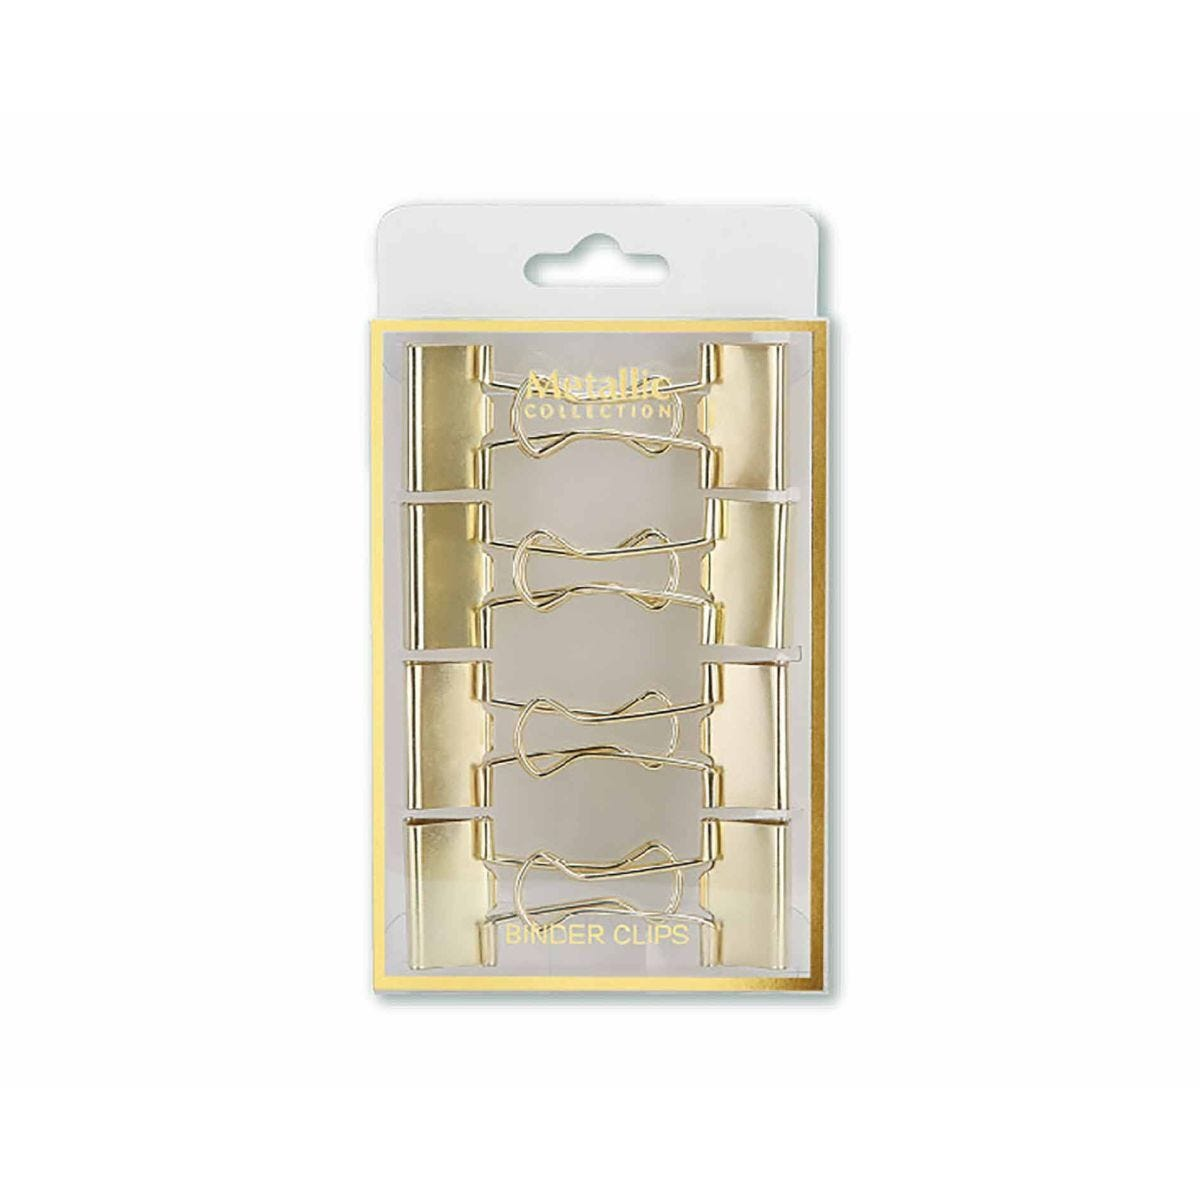 25mm Foldback Clips Gold Pack of 8